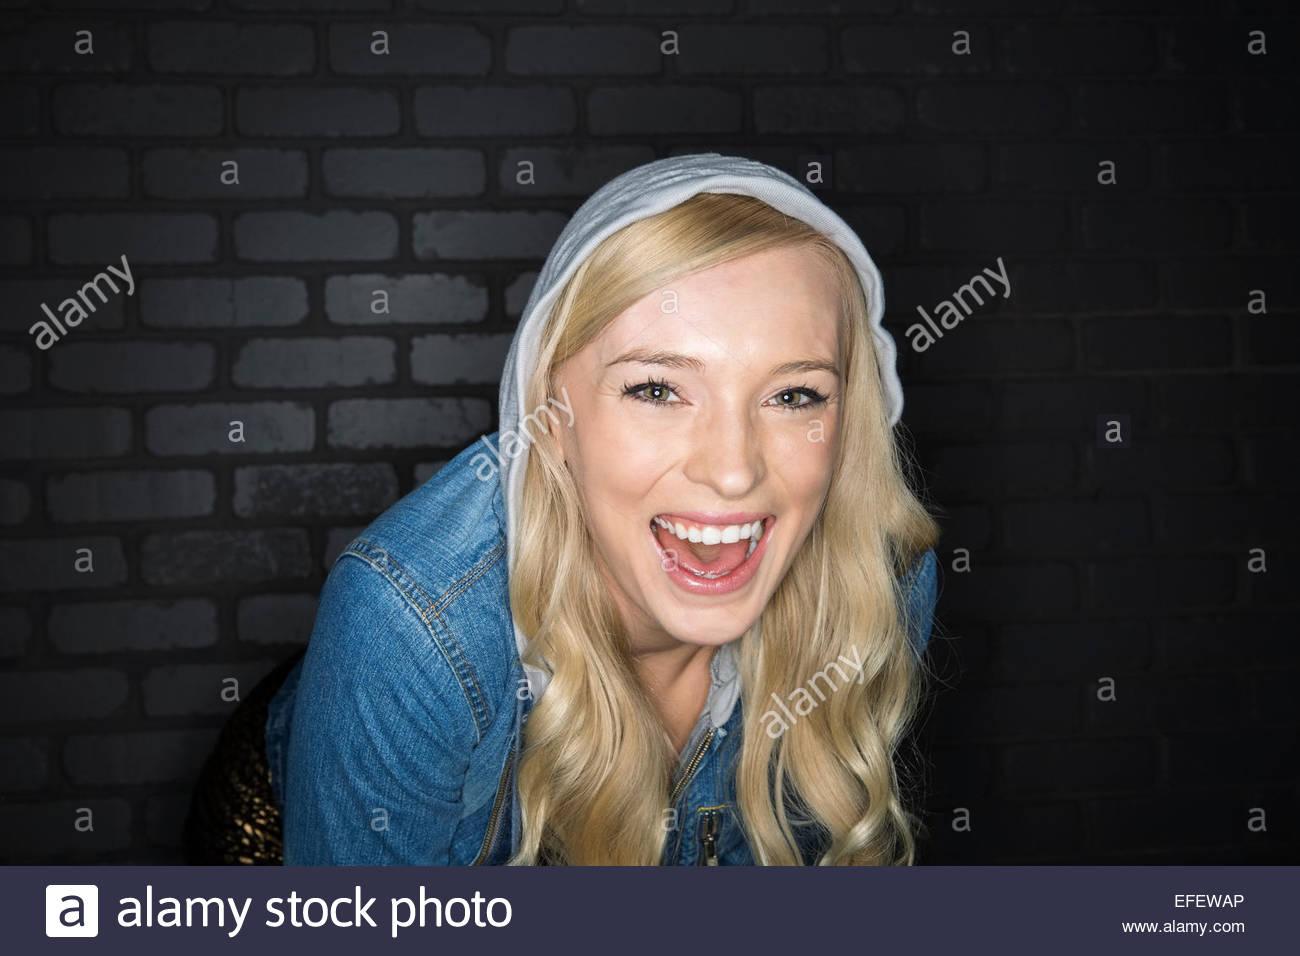 Portrait of laughing blonde woman wearing hoody - Stock Image